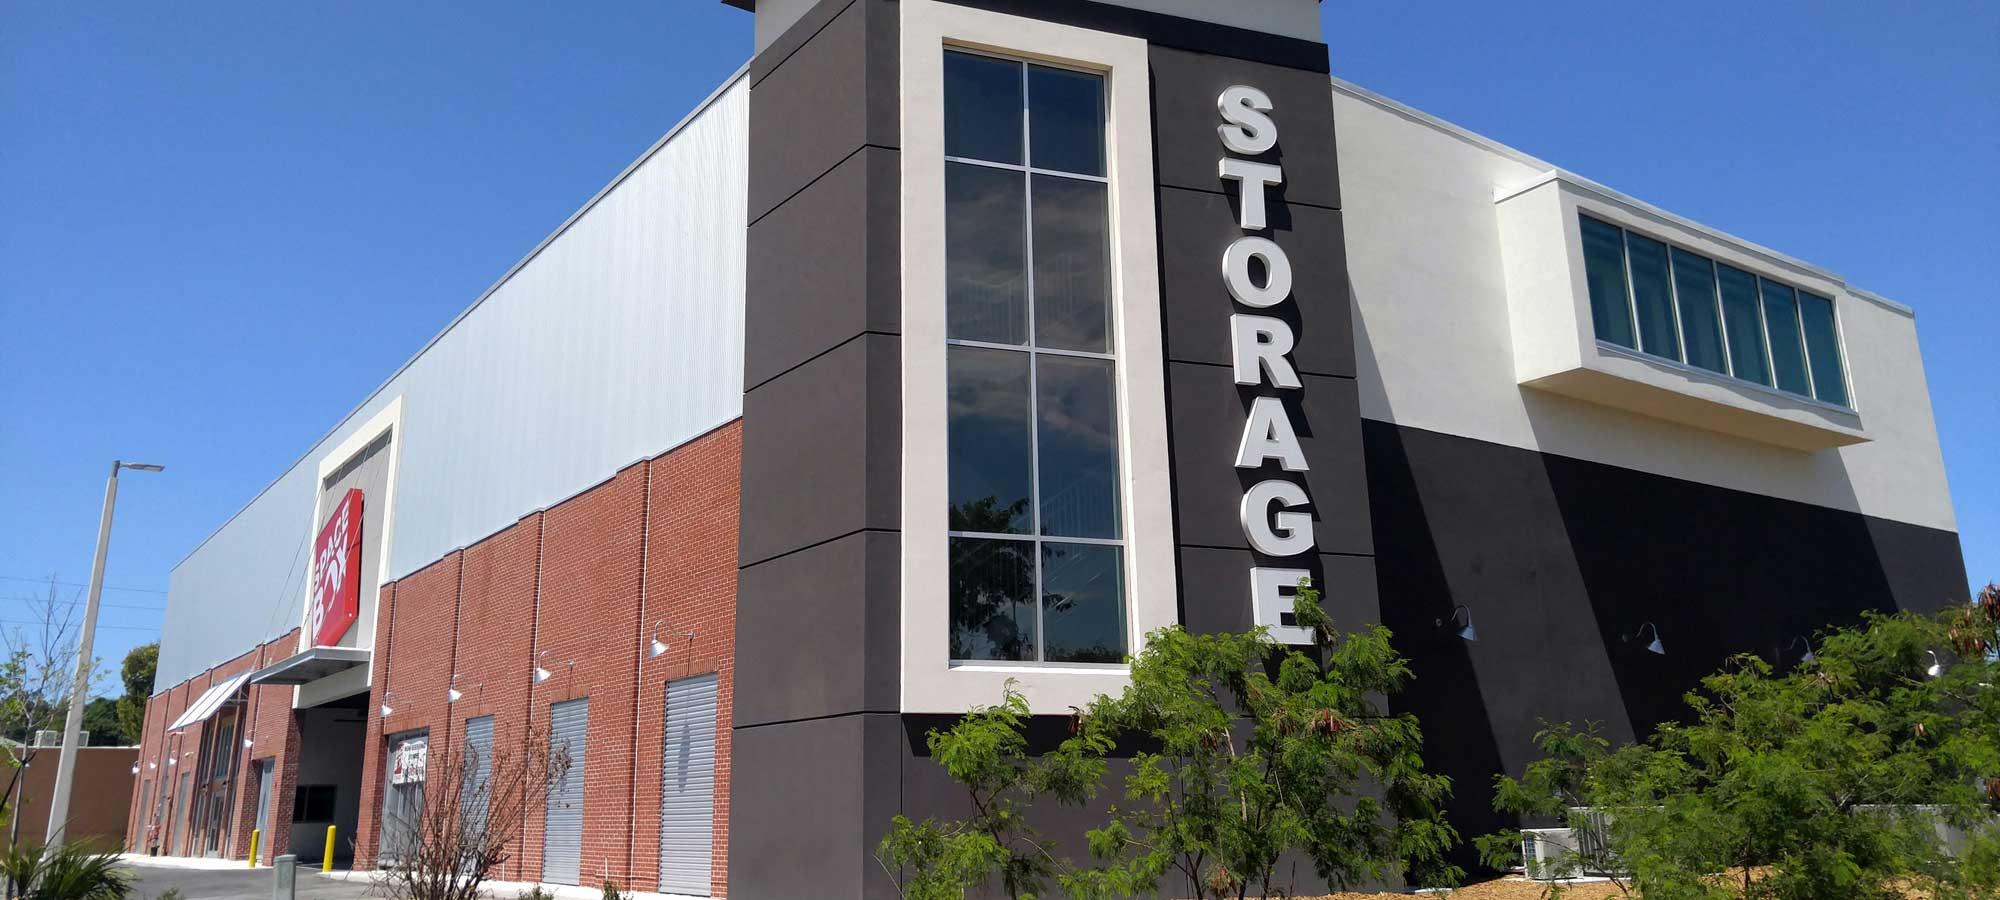 self storage units south tampa fl spacebox storage. Black Bedroom Furniture Sets. Home Design Ideas